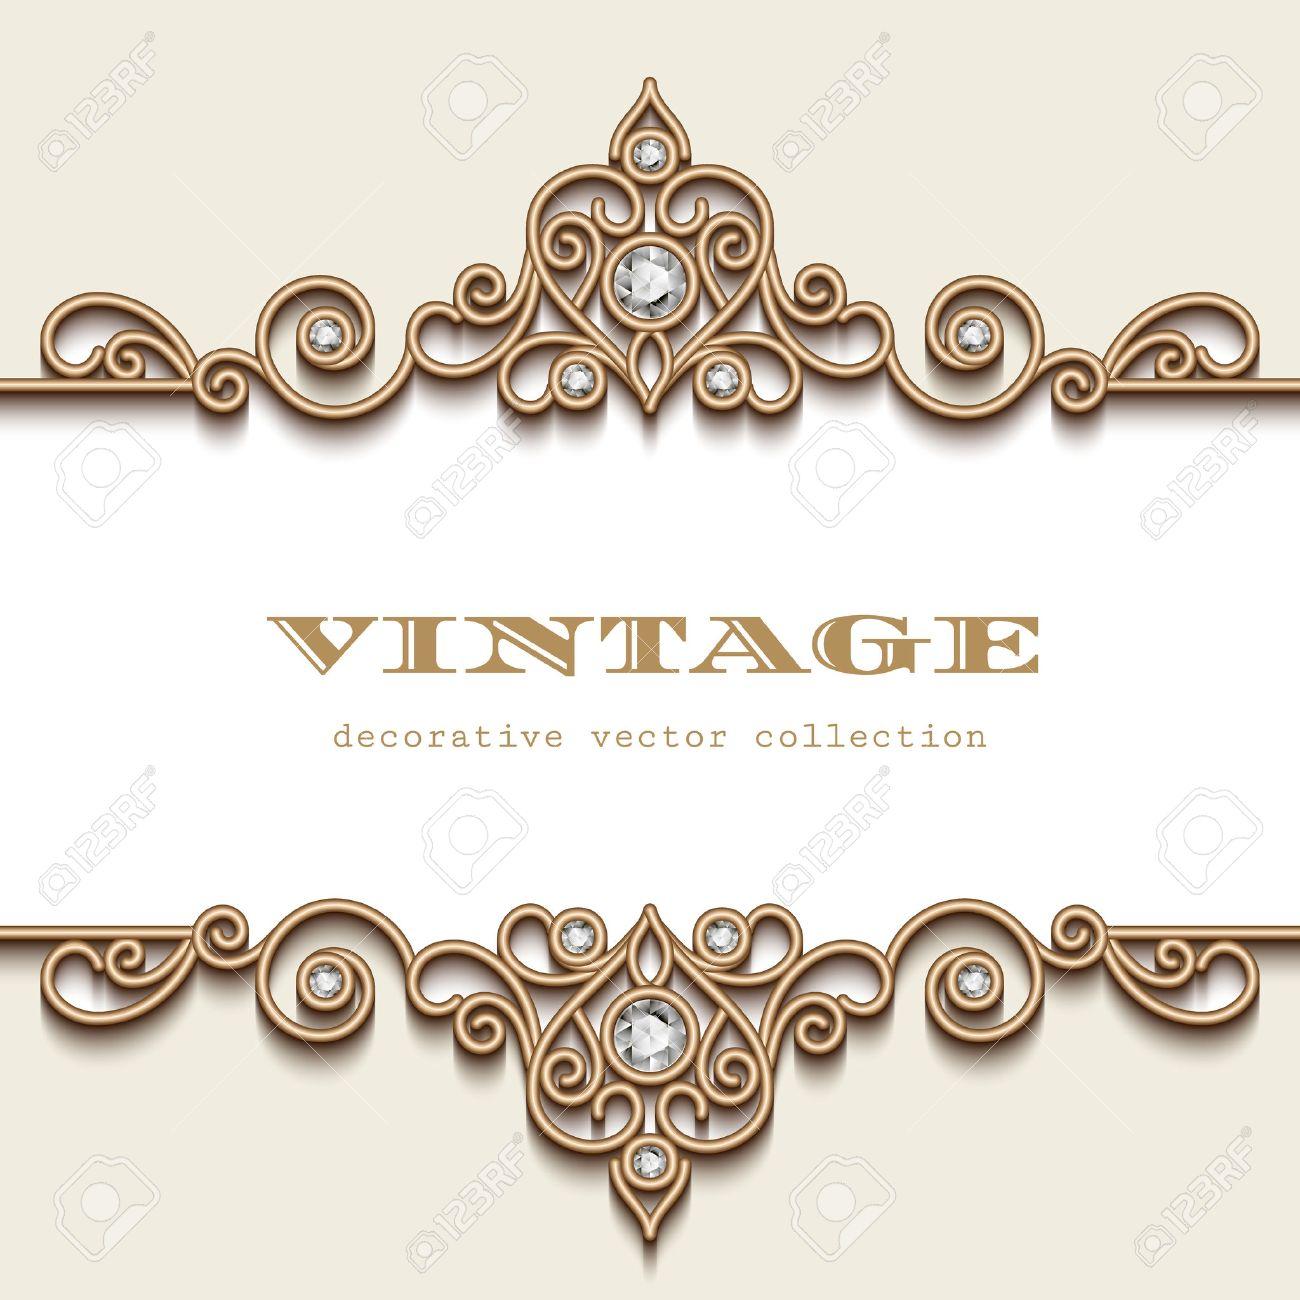 Vintage gold jewelry frame on white, divider element, elegant header with jewellery border ornament - 50933680